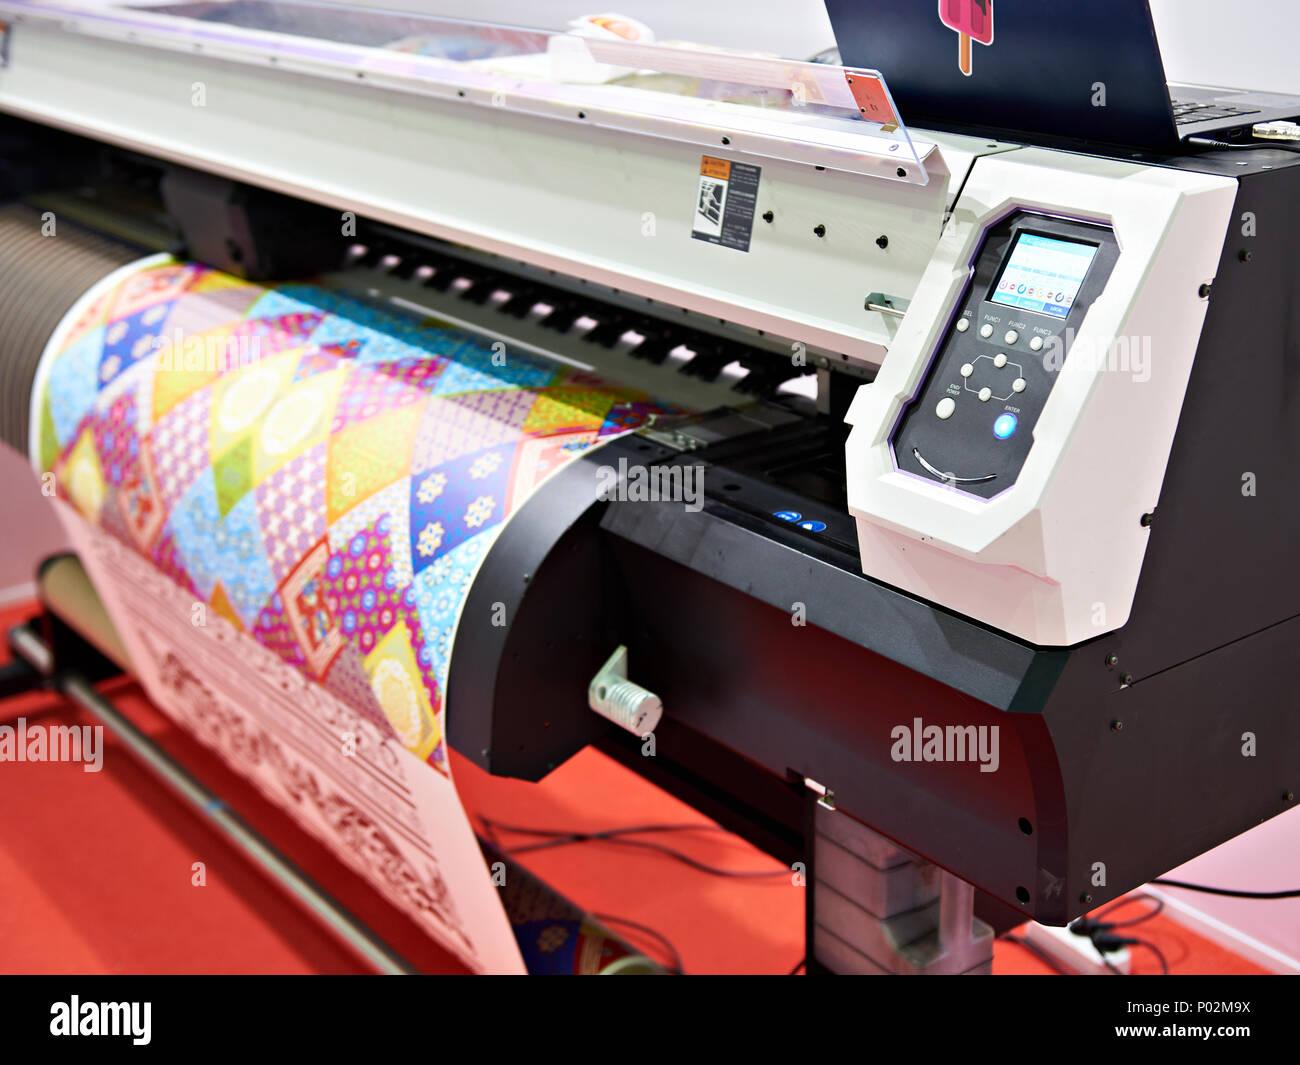 Big plotter printer with LED control panel - Stock Image